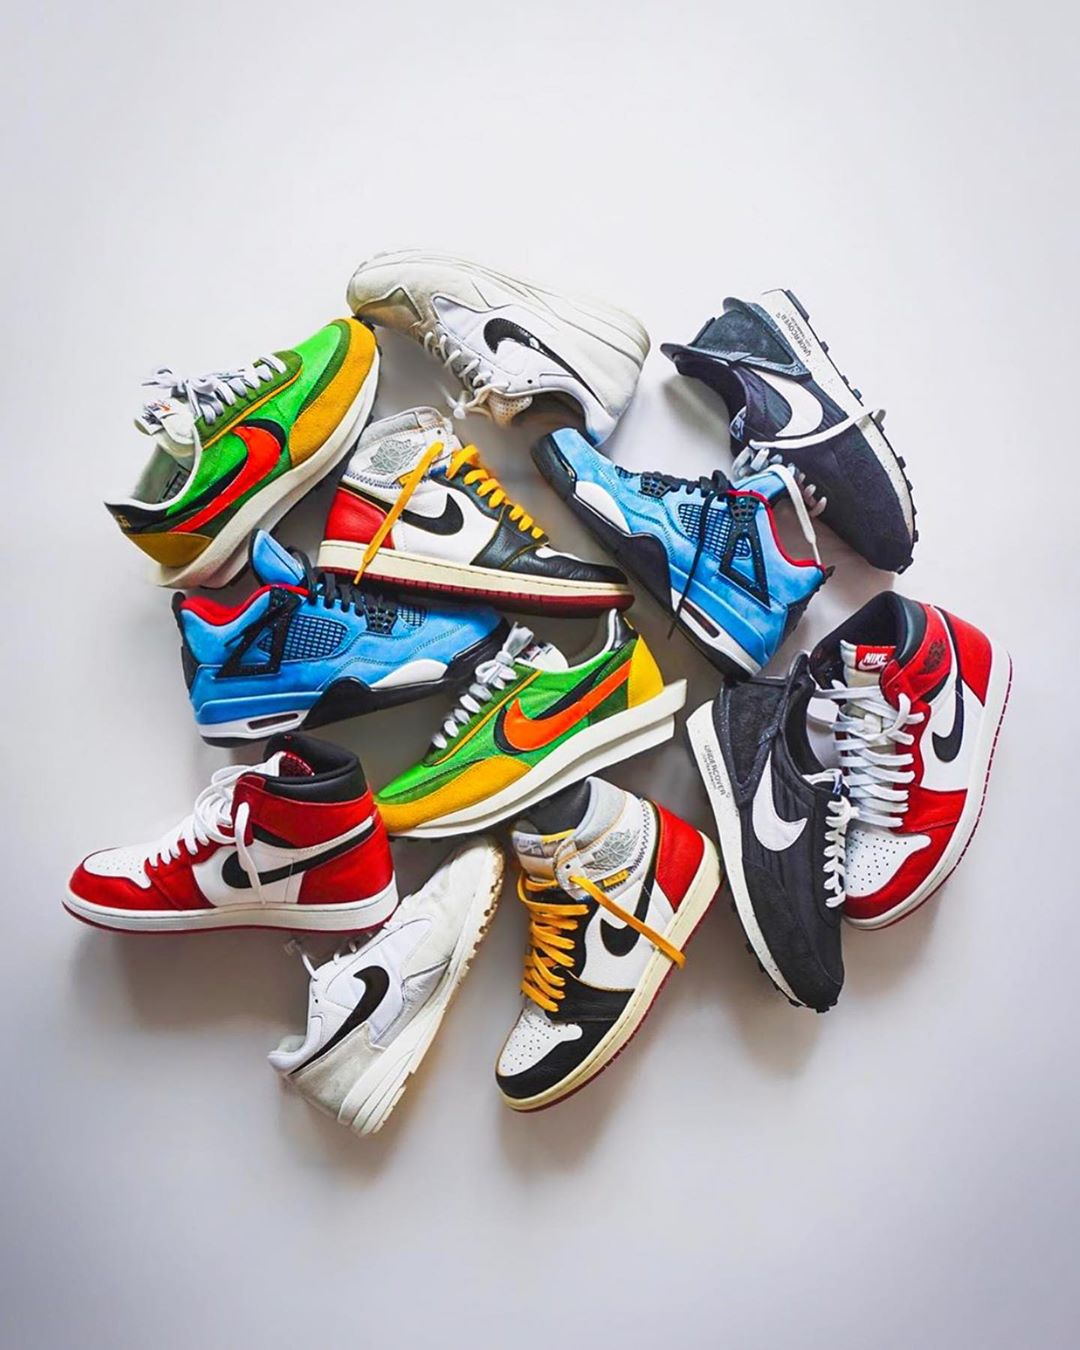 Air jordan 1,AJ1,Dunk,Yeezy,OF 久违的周末快乐!潮流年货准备了吗?一周球鞋美图欣赏 1/10